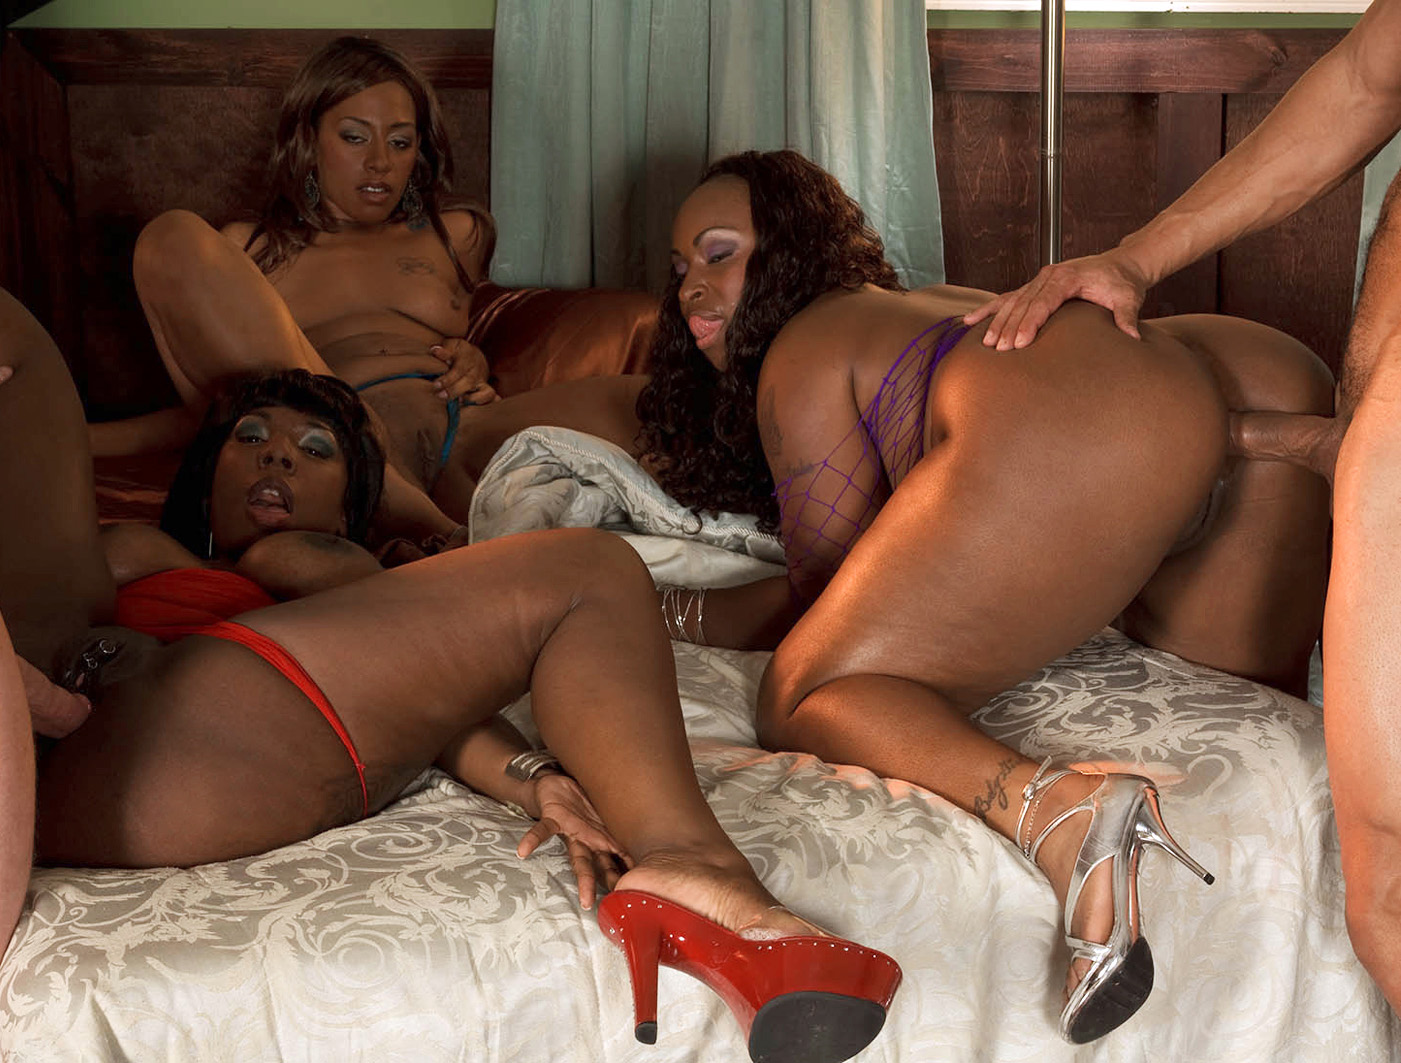 Black milf porn pics, ebony milf galery